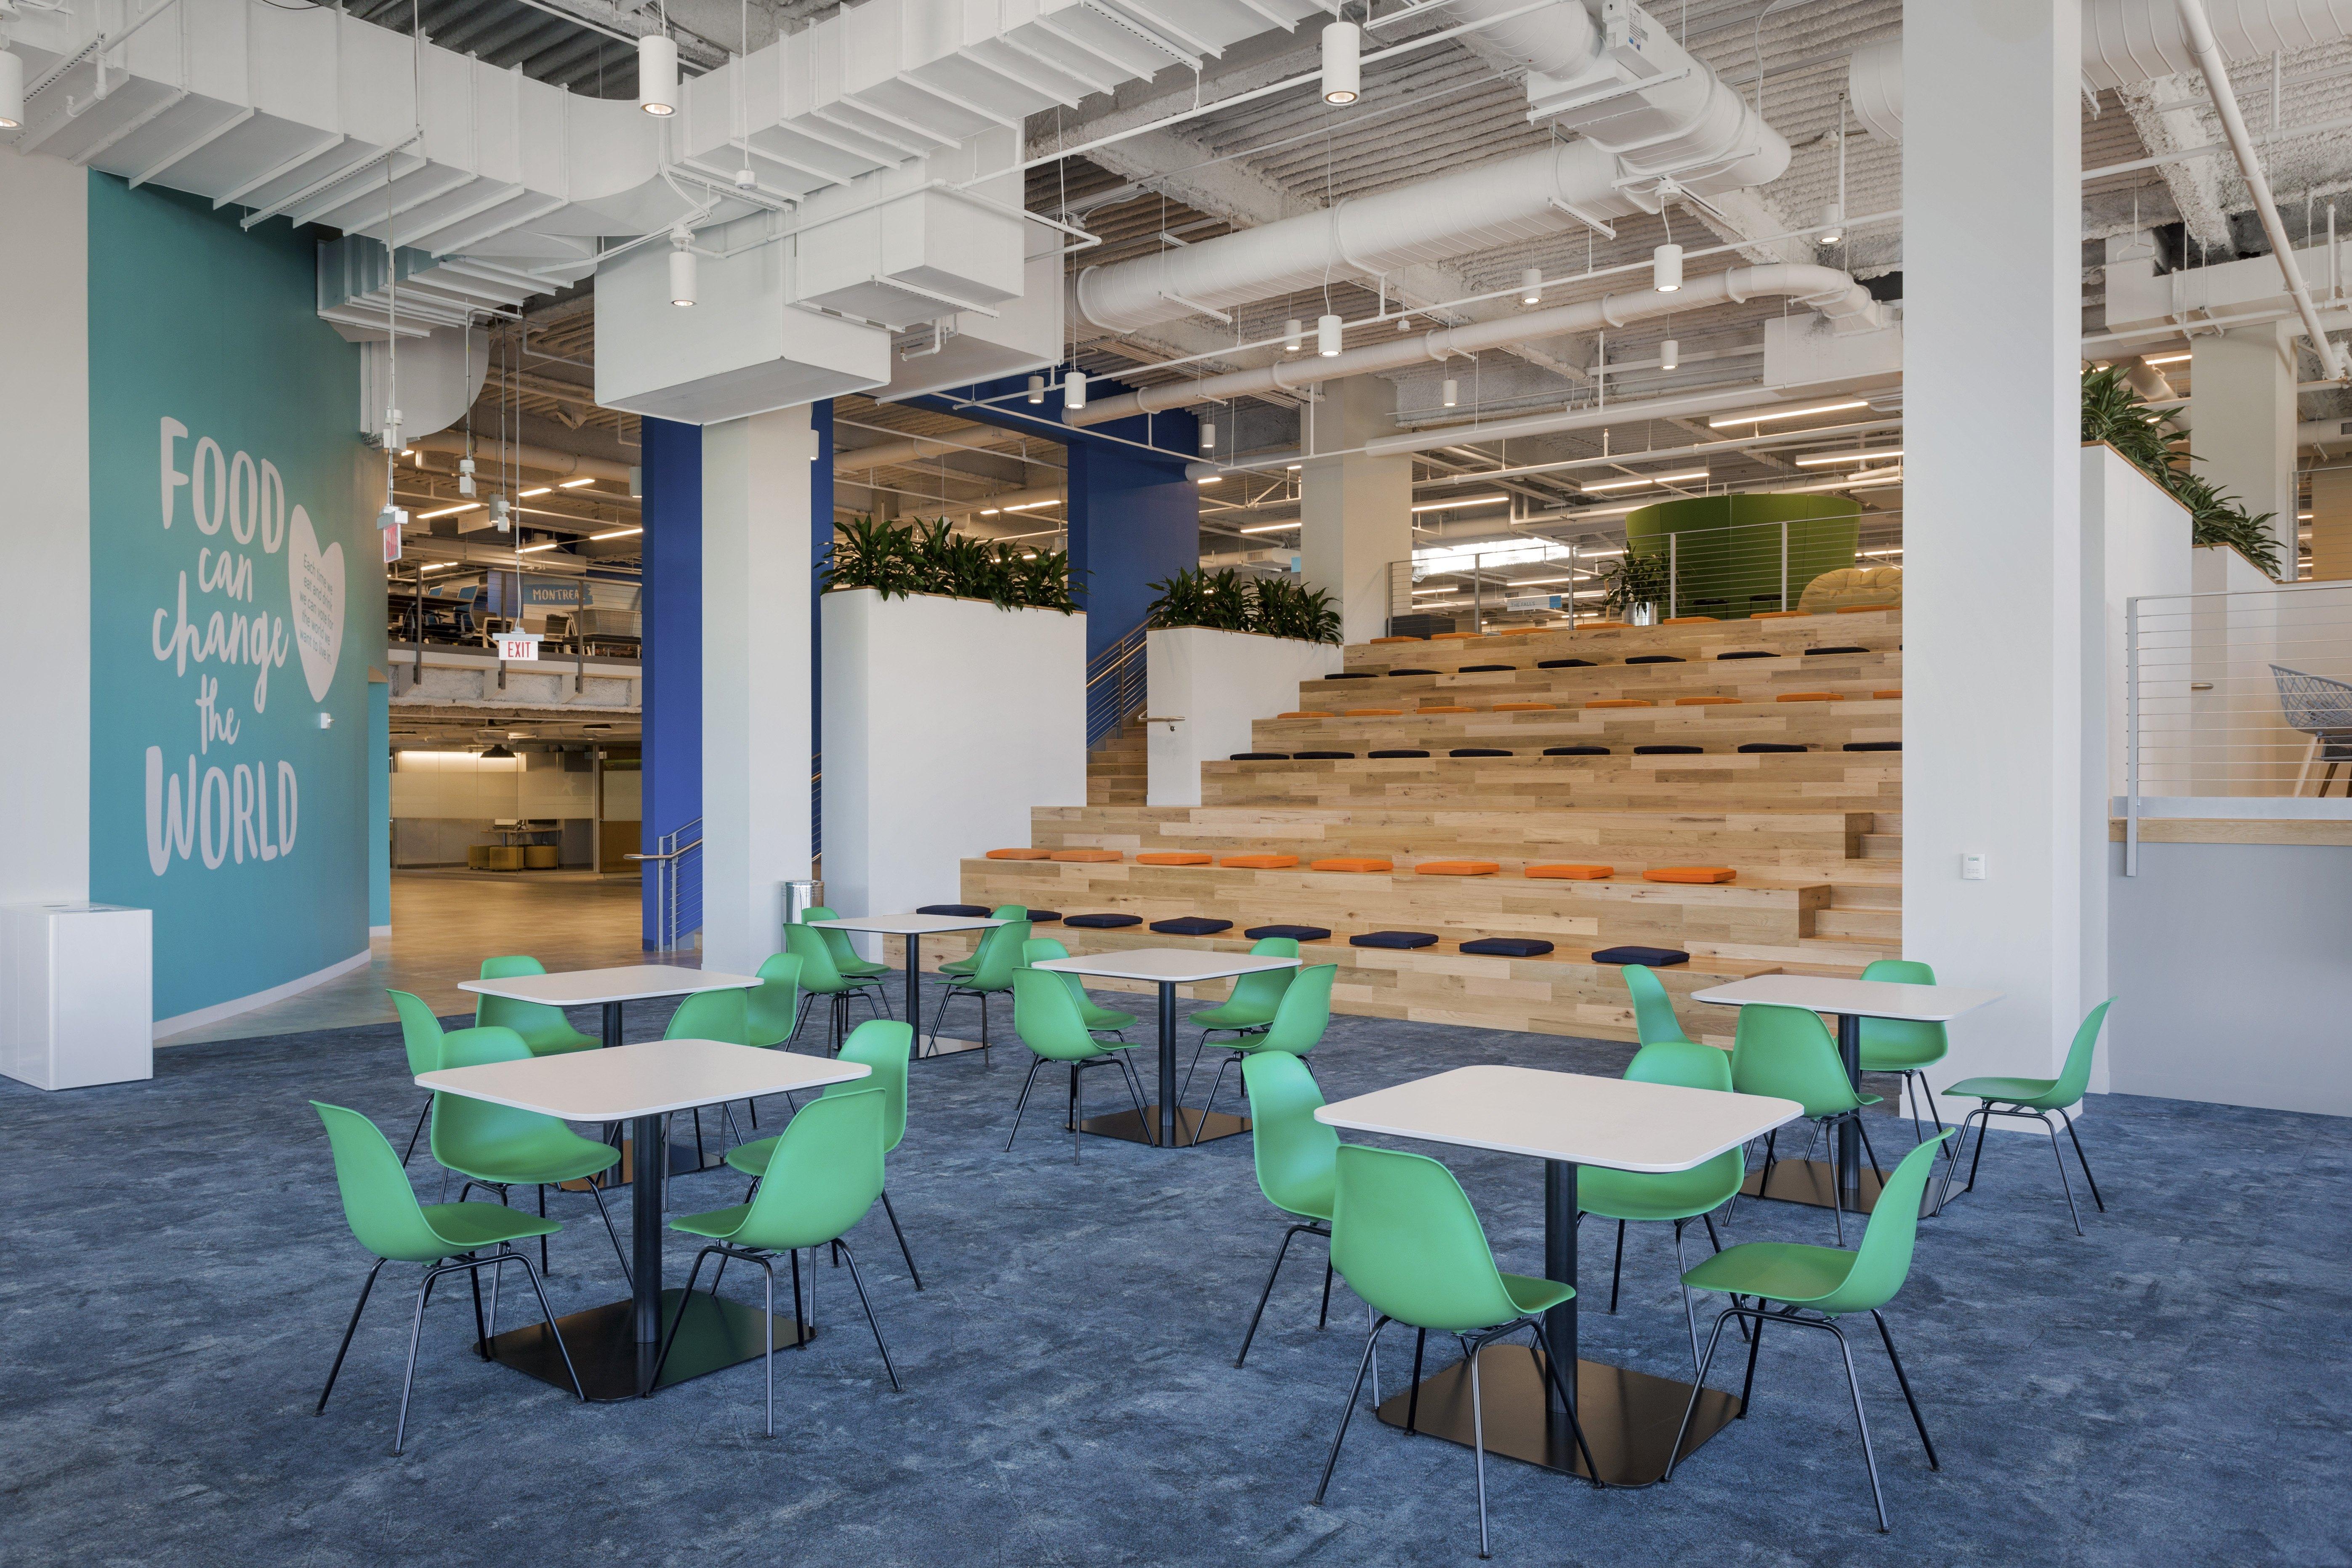 Commercial Flooring Concepts Danone North America